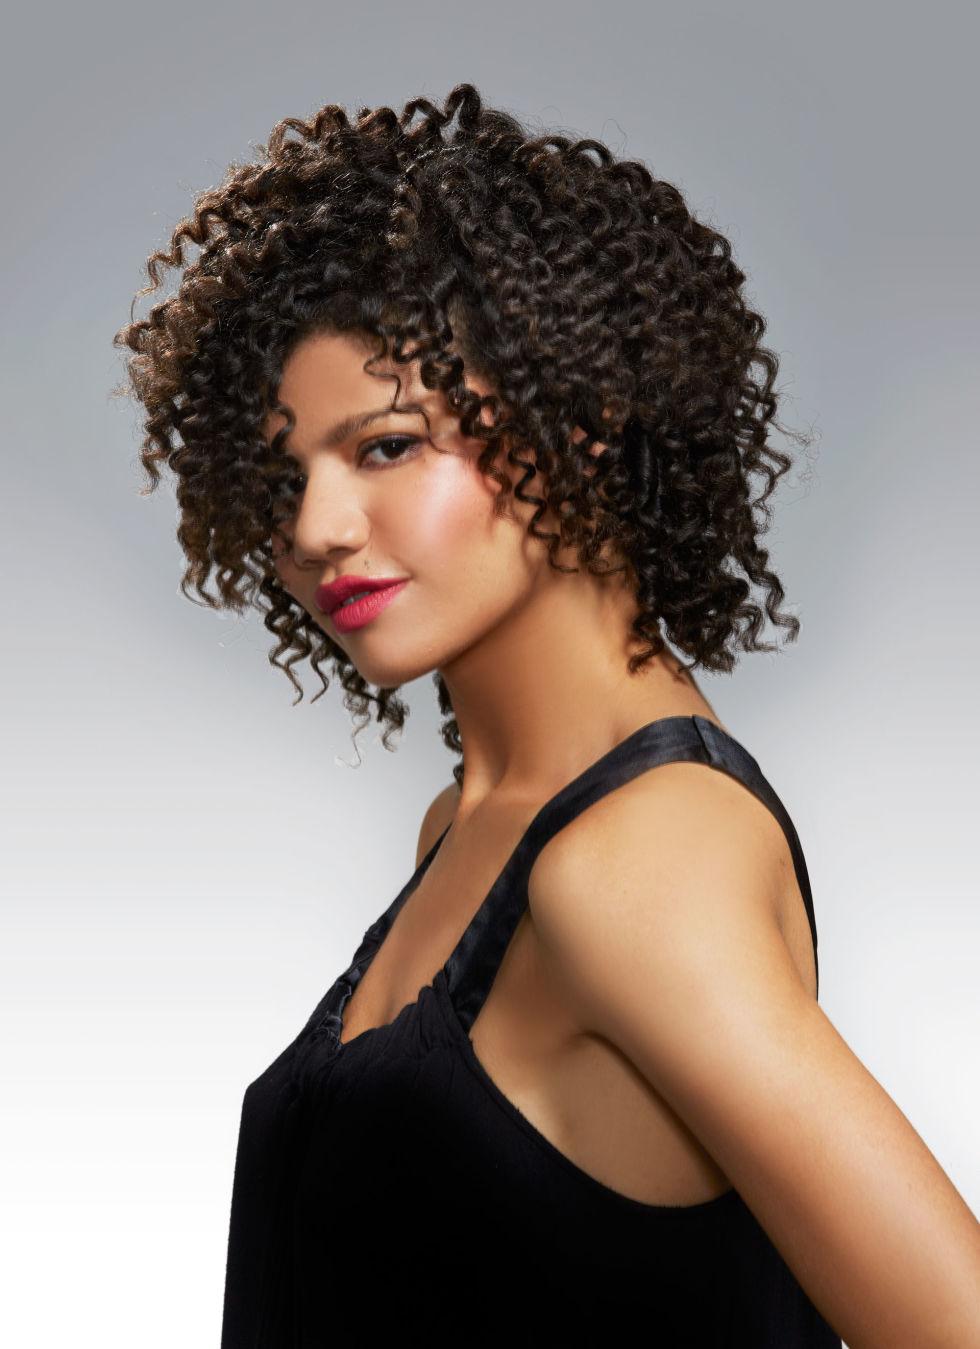 Awe Inspiring 29 Black Hairstyles Best African American Hairstyles Amp Haircuts Short Hairstyles Gunalazisus